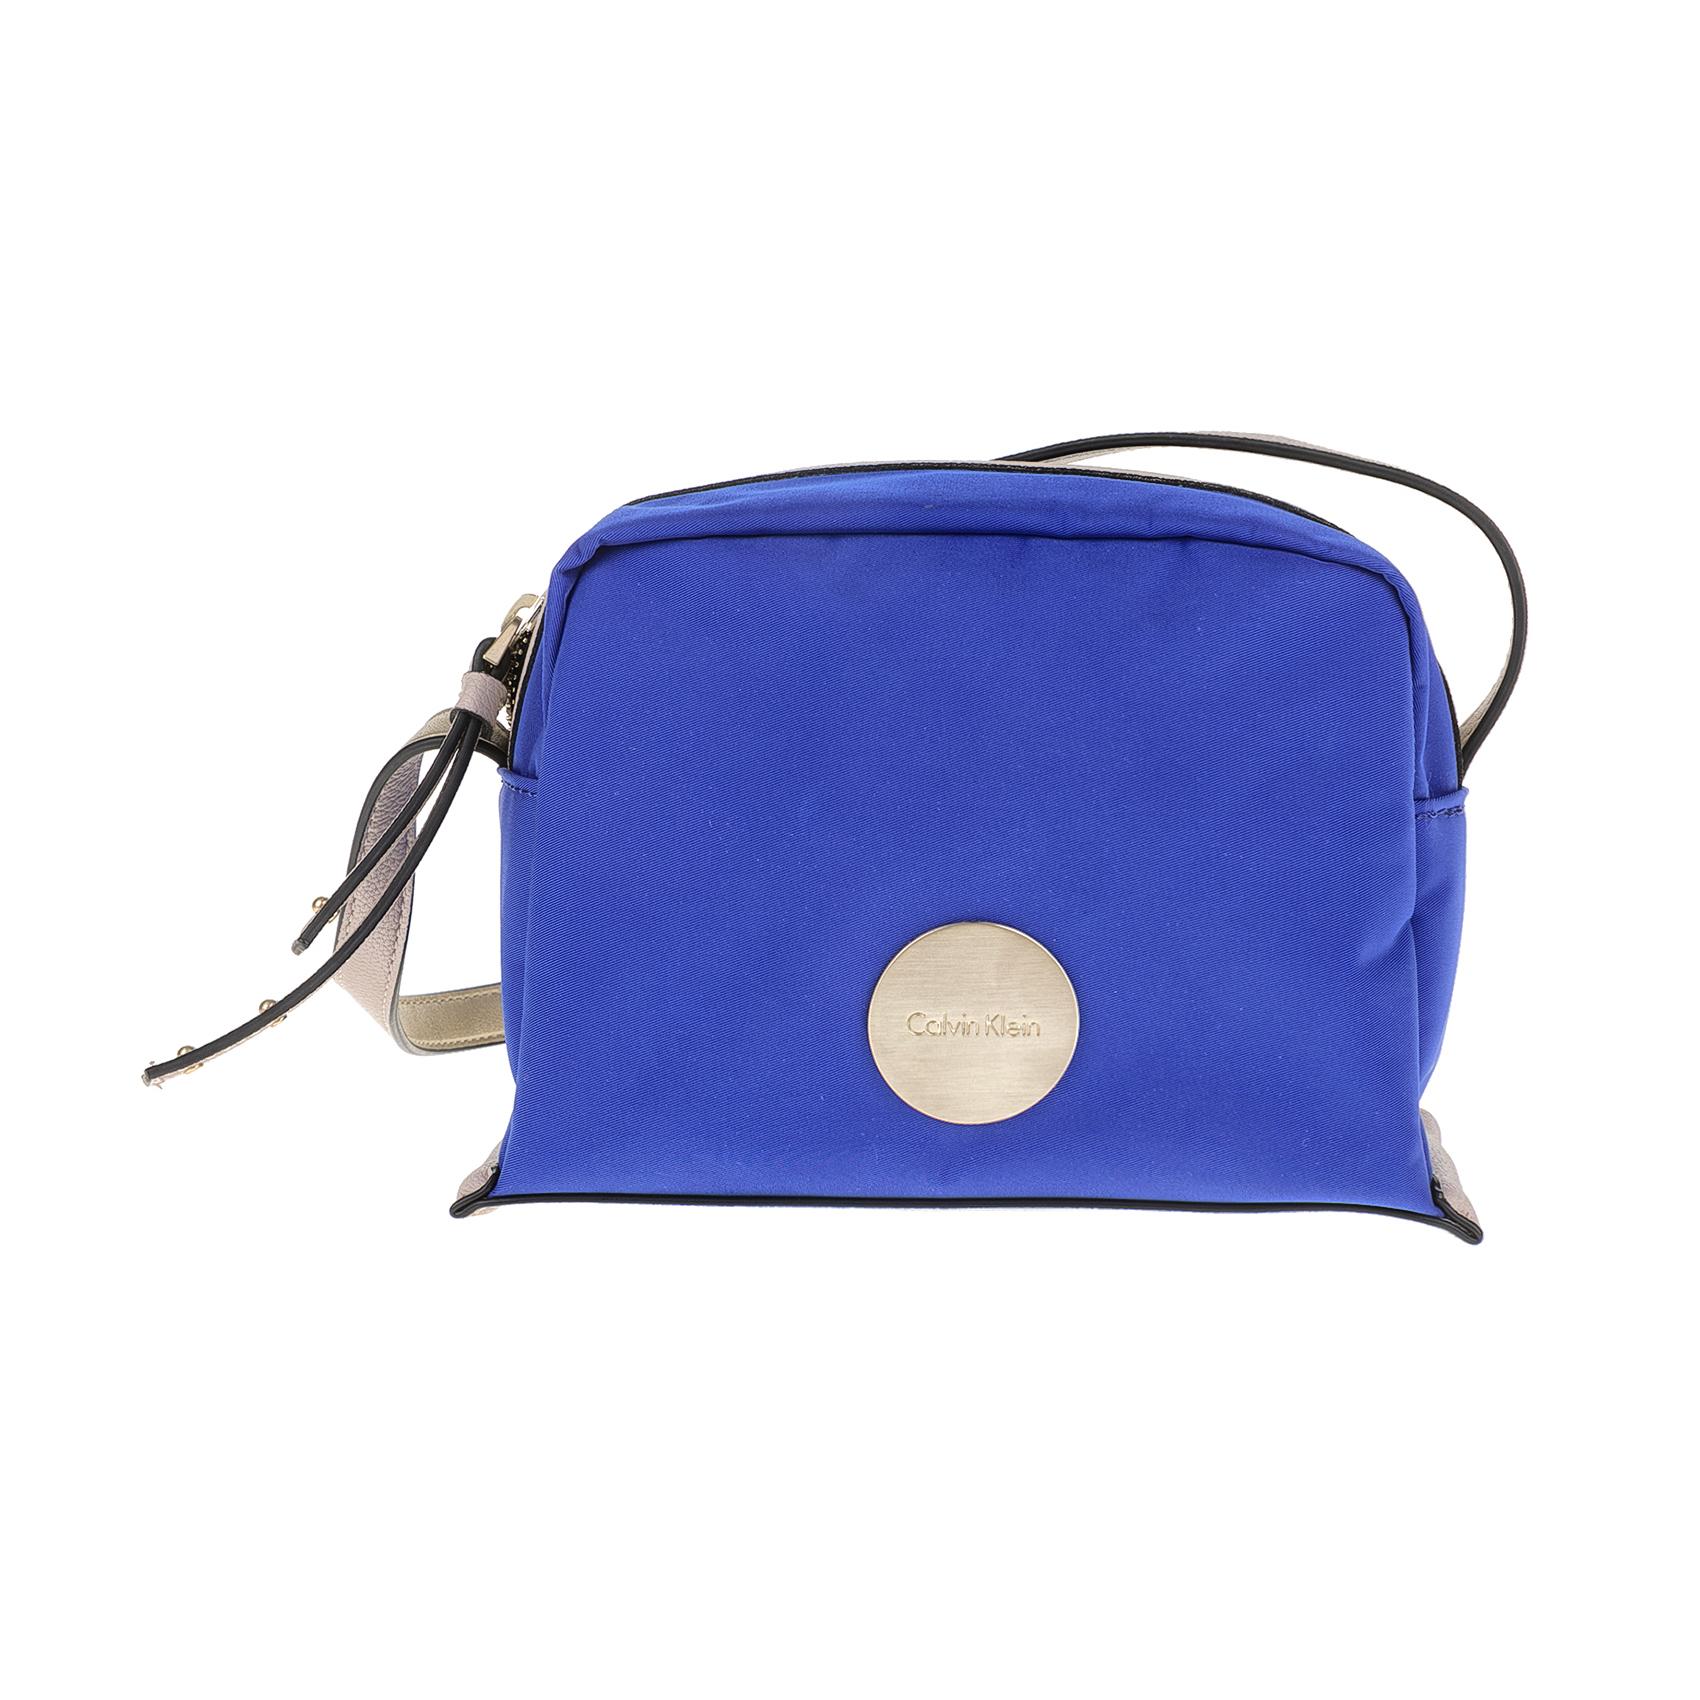 CALVIN KLEIN JEANS – Γυναικεία τσάντα CALVIN KLEIN JEANS EDITH SMALL μπλε ecc72522c15